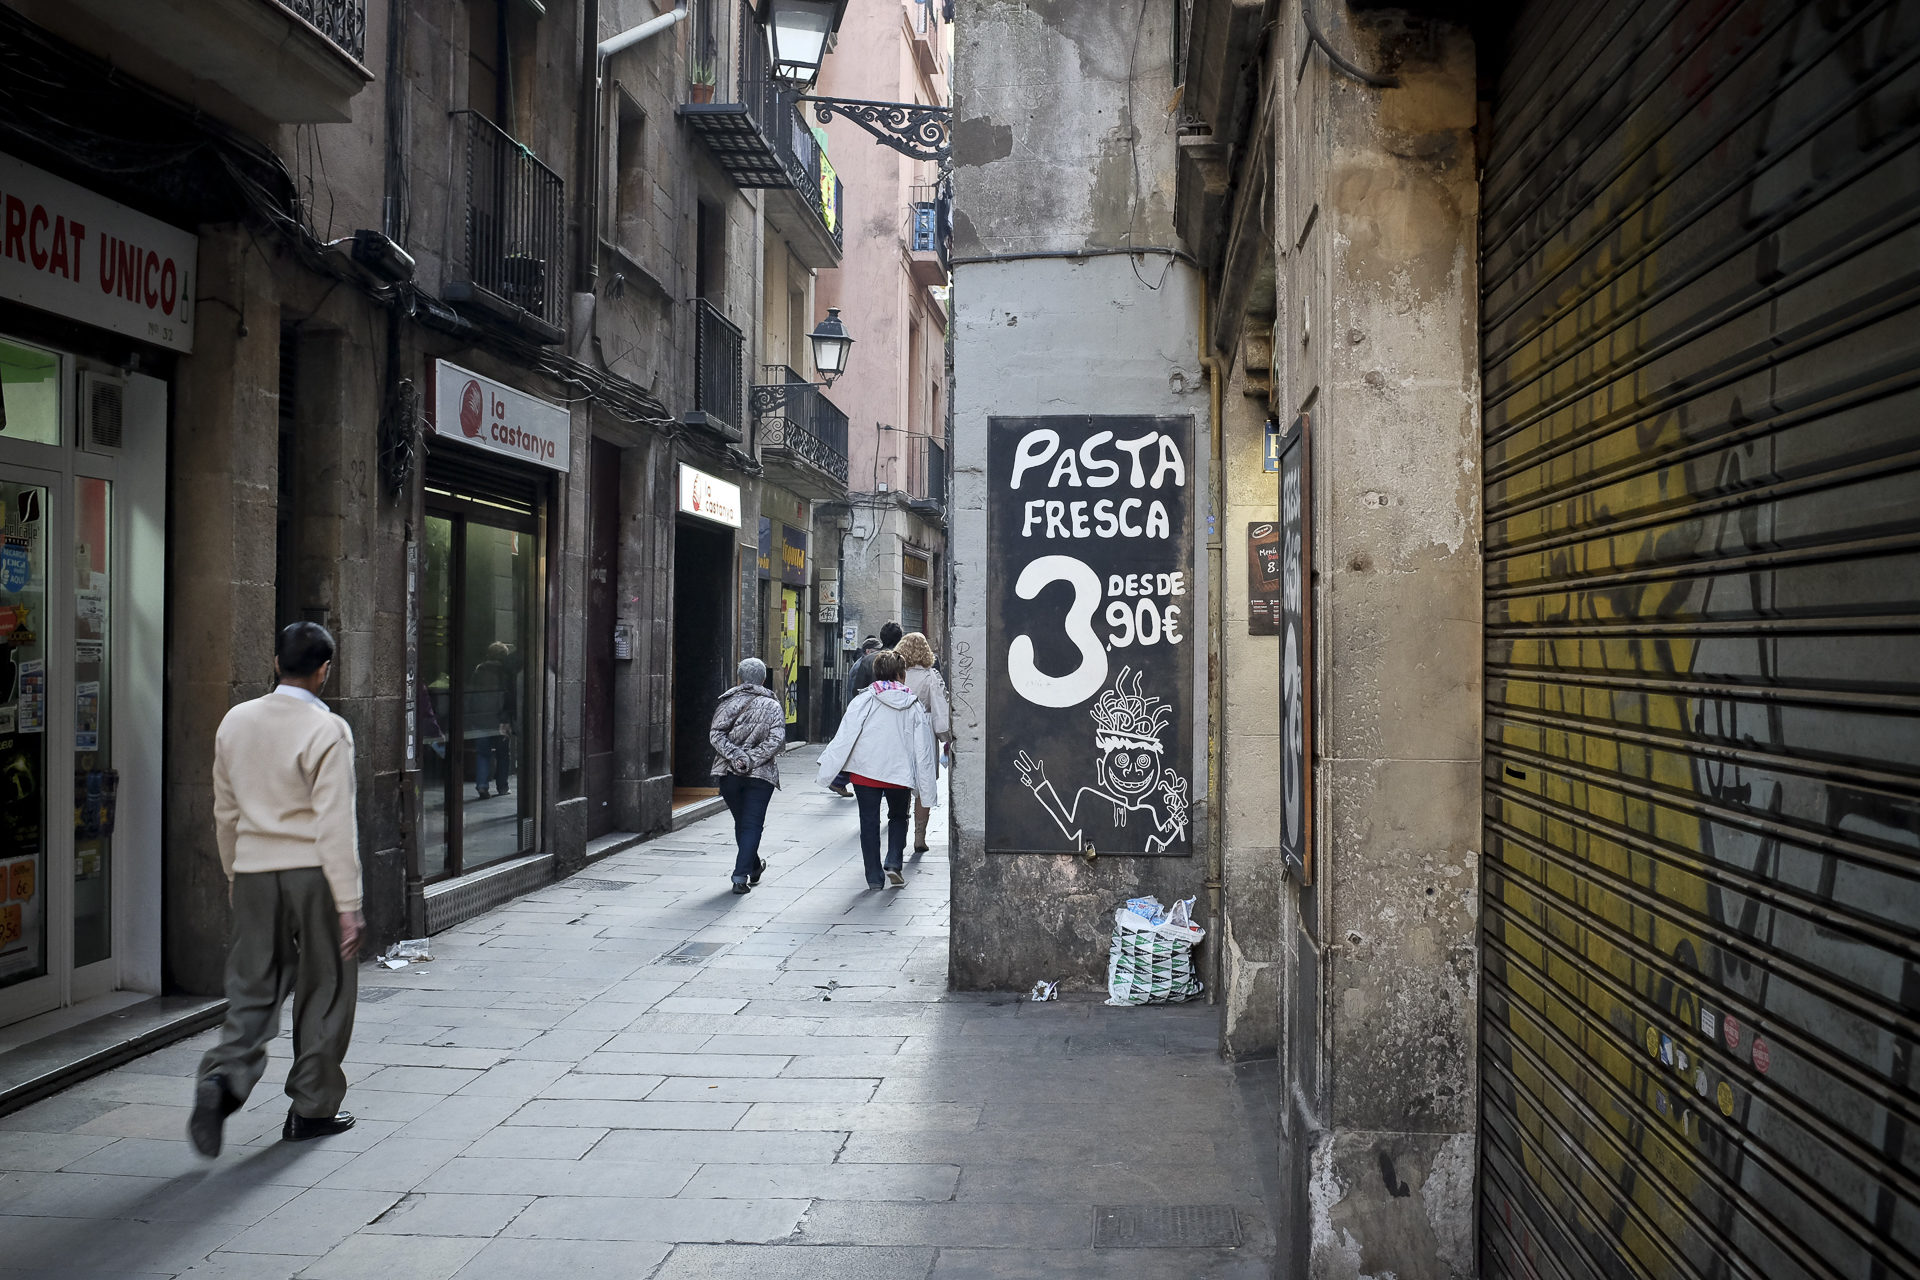 barcelona_19_03_copyright_thomas_schmidt_106